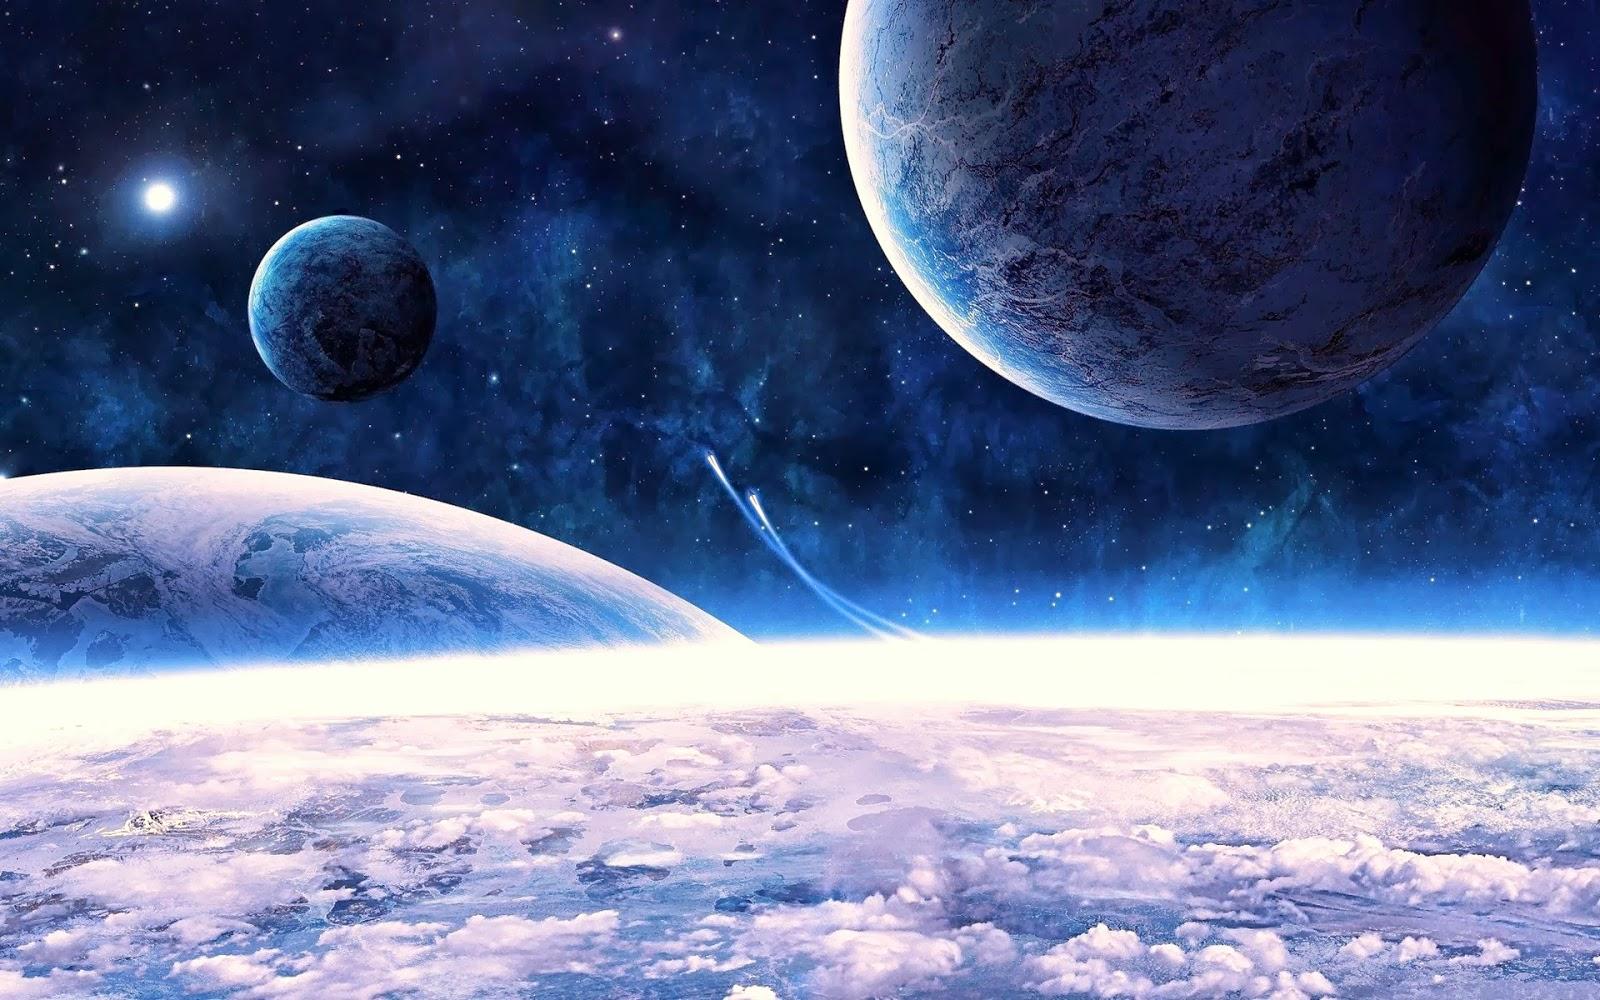 [45+] Cool Planet Wallpapers on WallpaperSafari